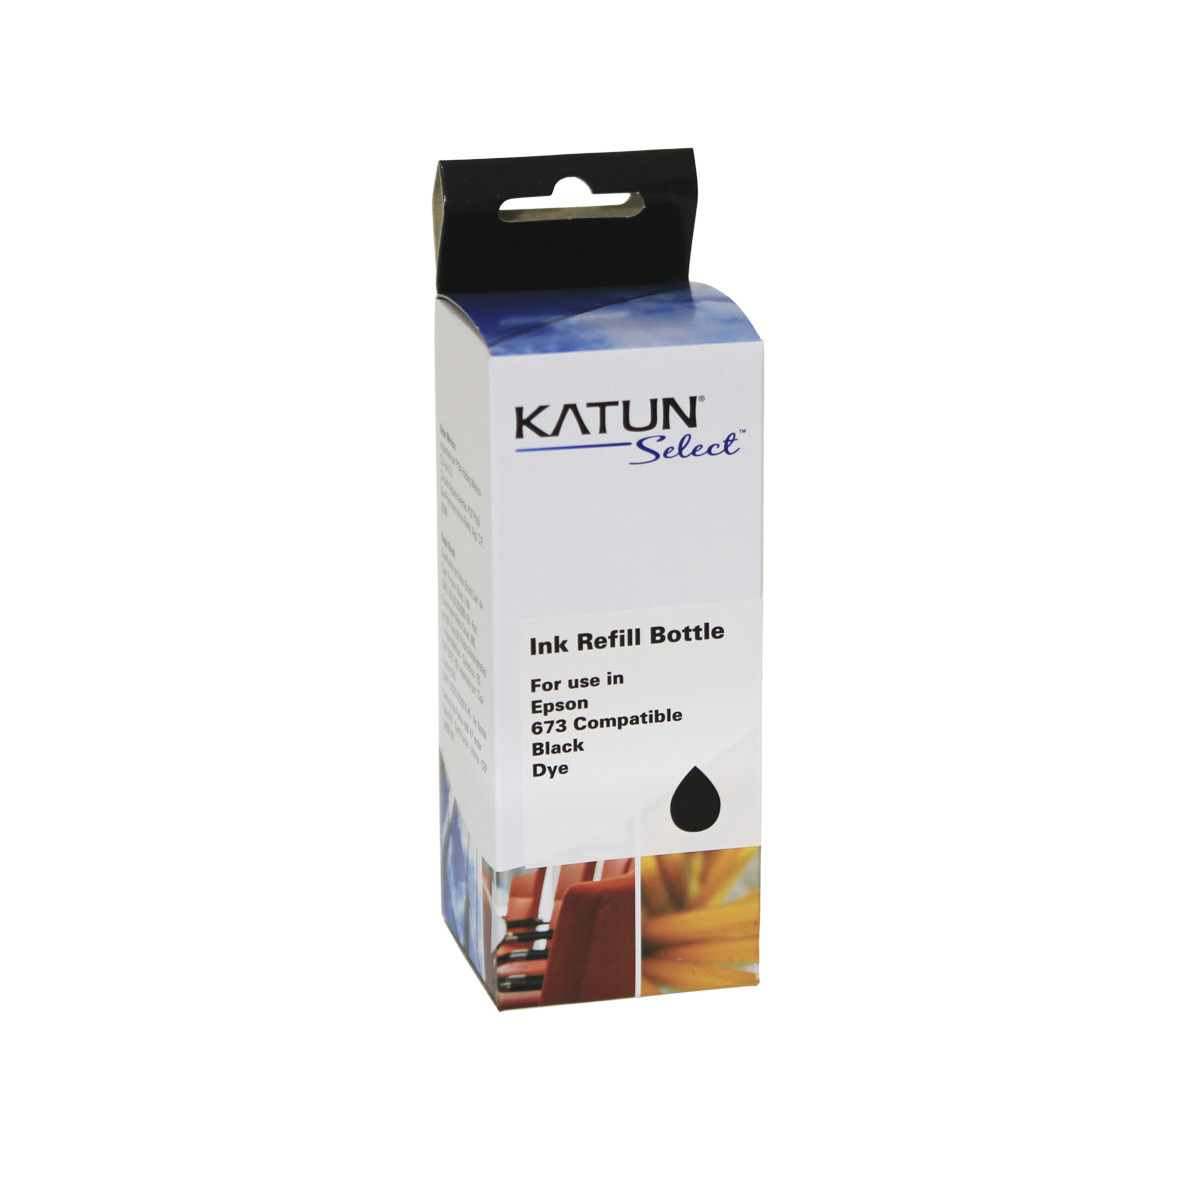 Tinta Compatível com Epson T673 T673120 Preto | L1800 L800 L805 L810 L850 | Katun Select 100ml